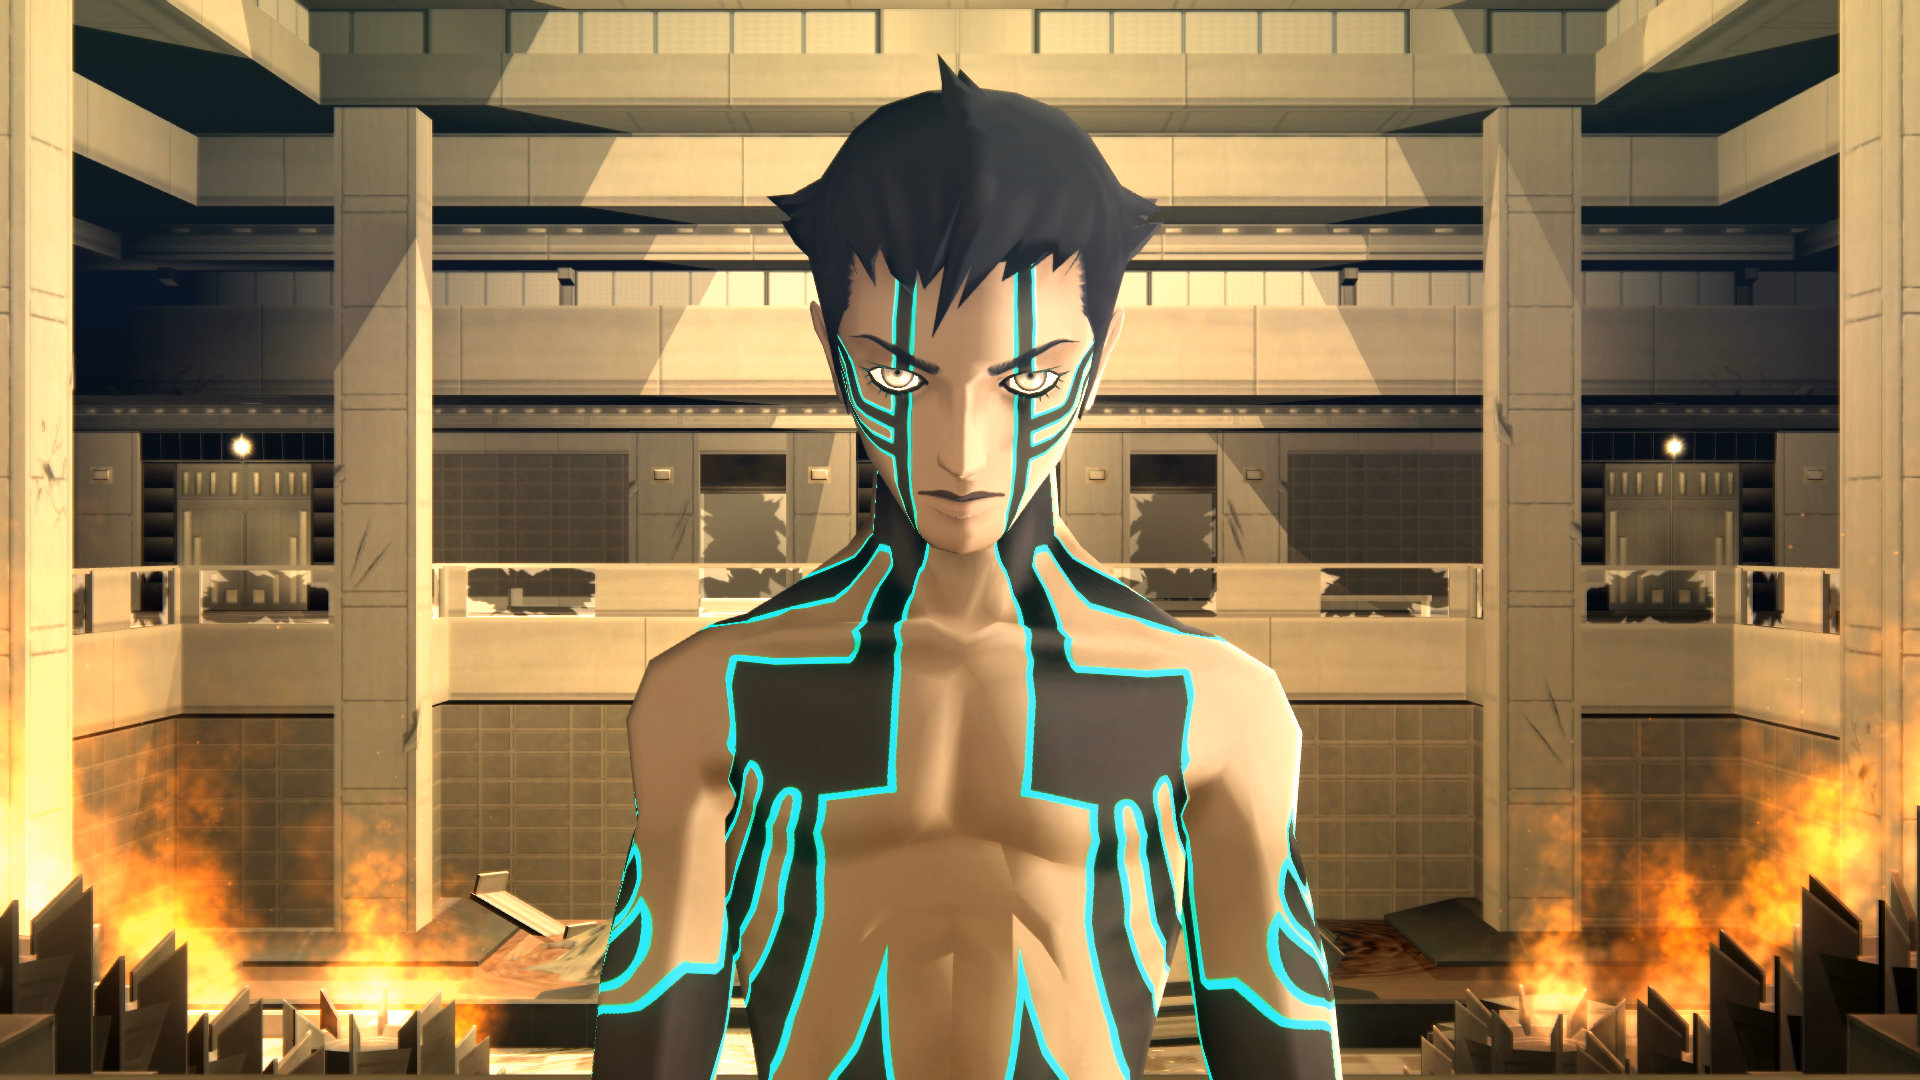 Screenshot From Shin Megami Tensei III: Nocturne HD Remaster Featuring The Demi-Fiend